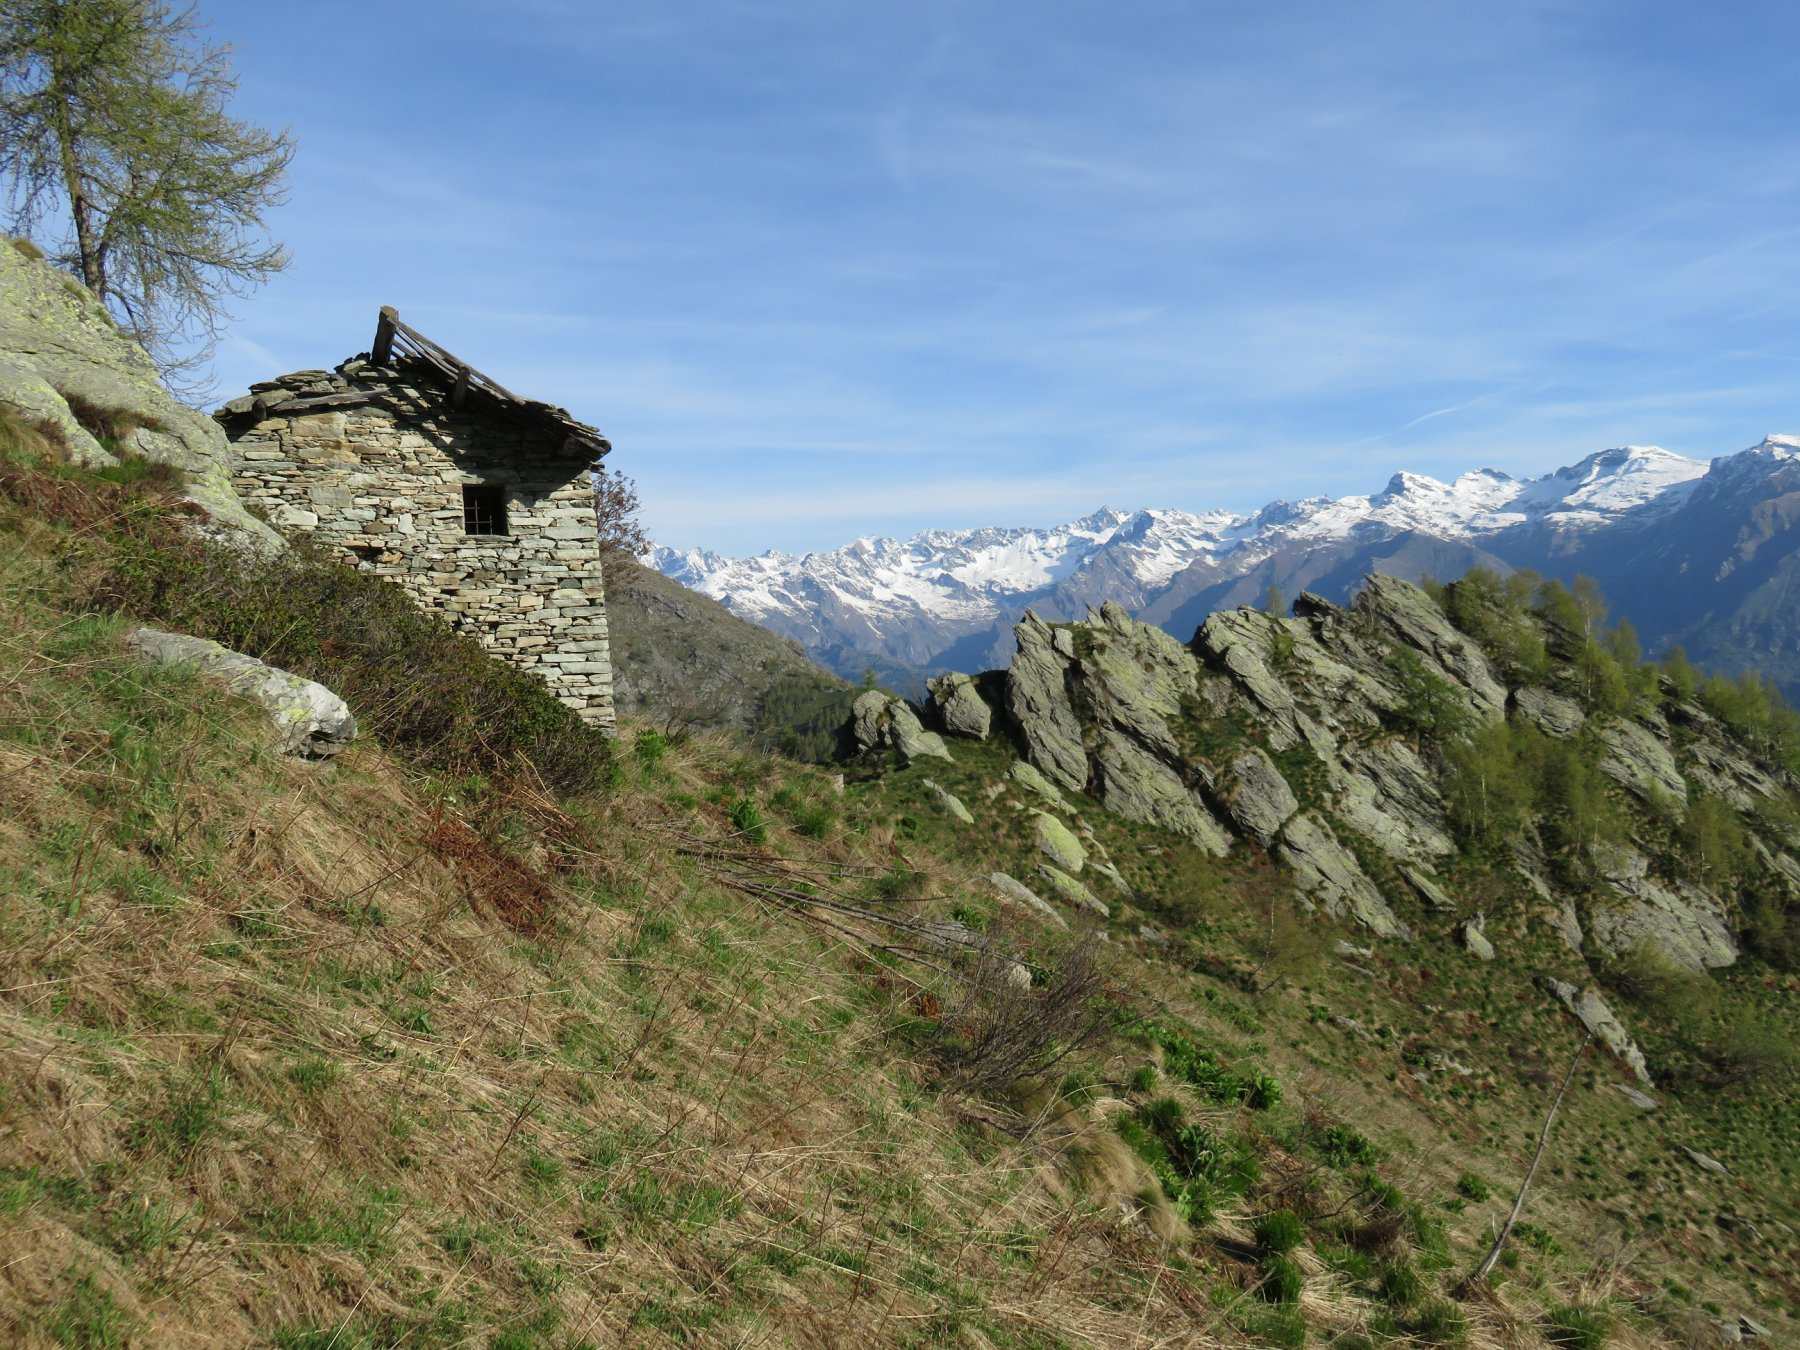 Arrivo all'Alpe Sprot